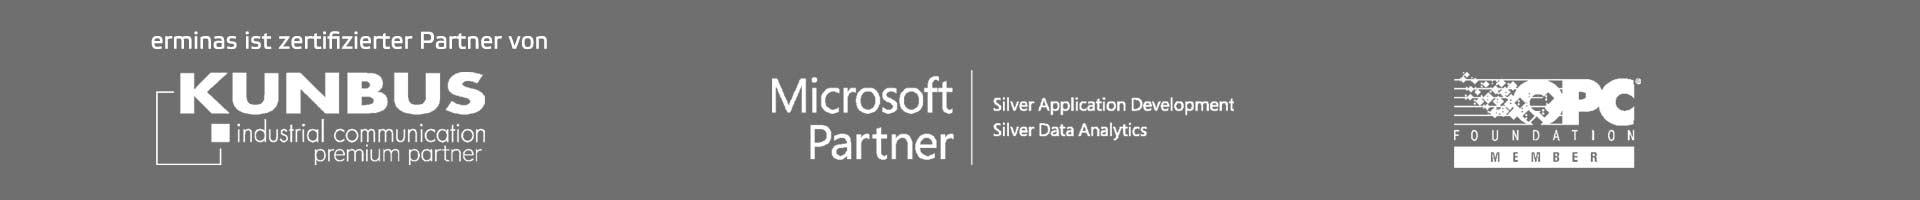 erminas Microsoft Silver Partner